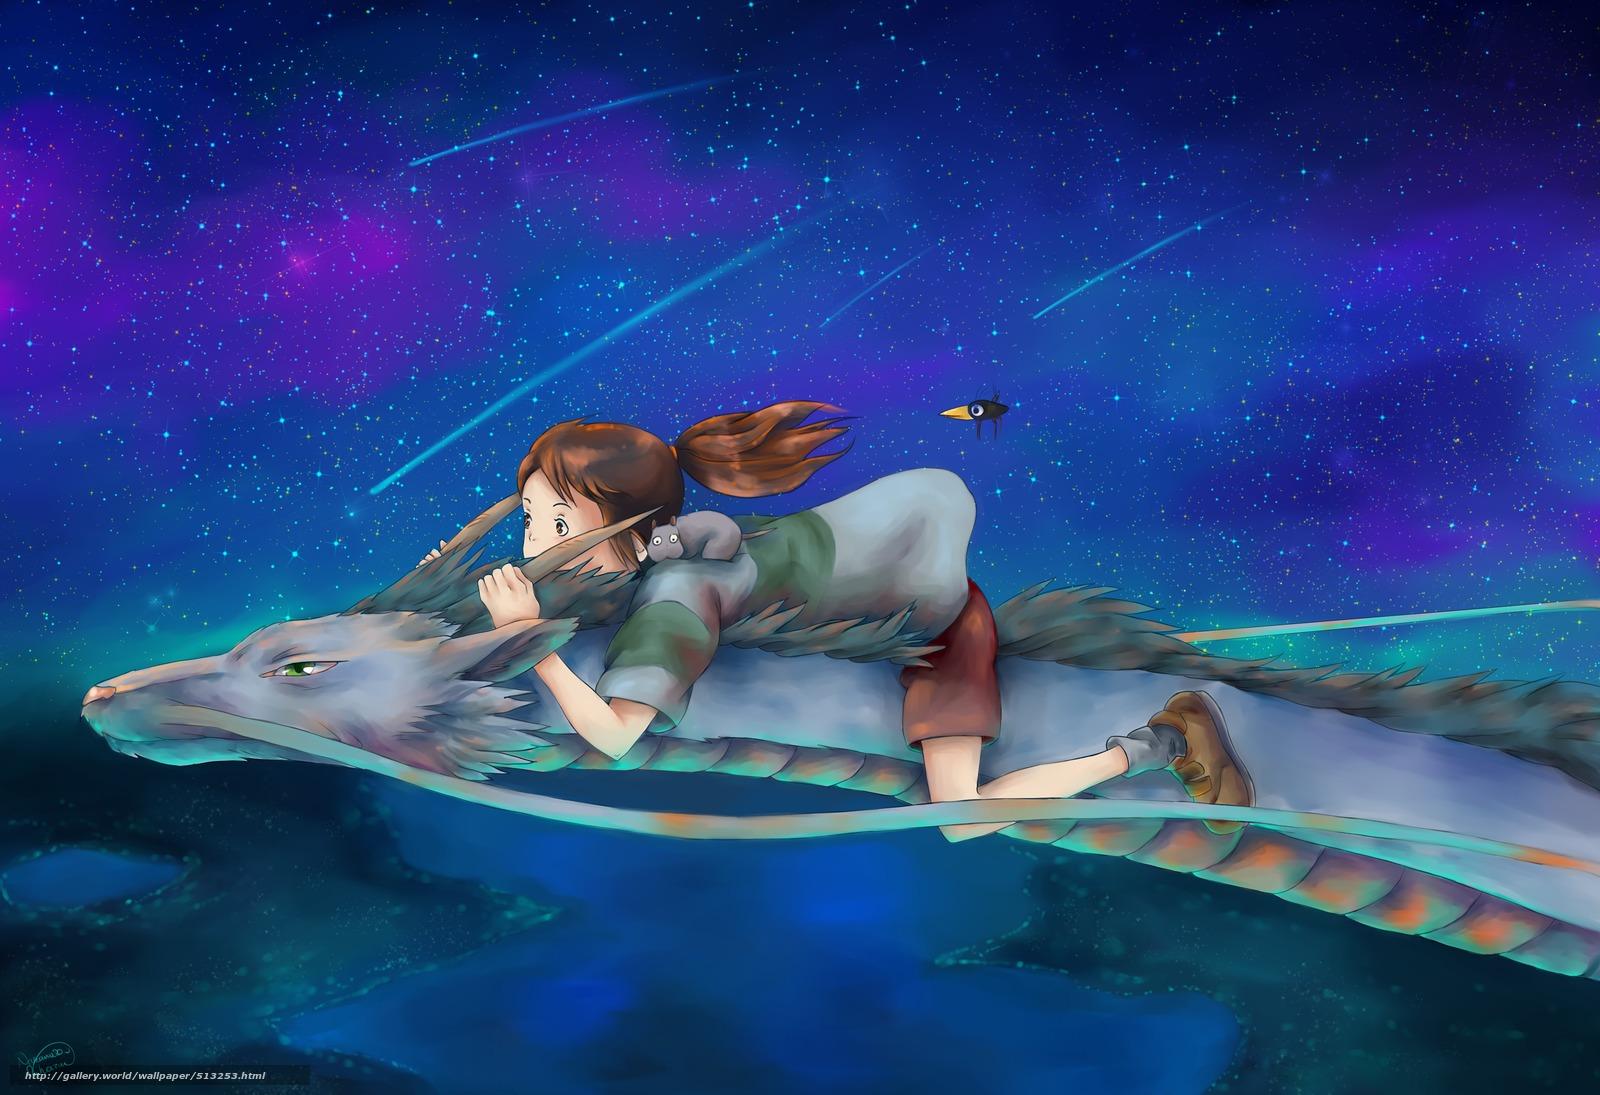 Tlcharger fond d 39 ecran chihiro hamster pirater le voyage de chihiro fonds d 39 ecran gratuits - Hamster gratuit ...